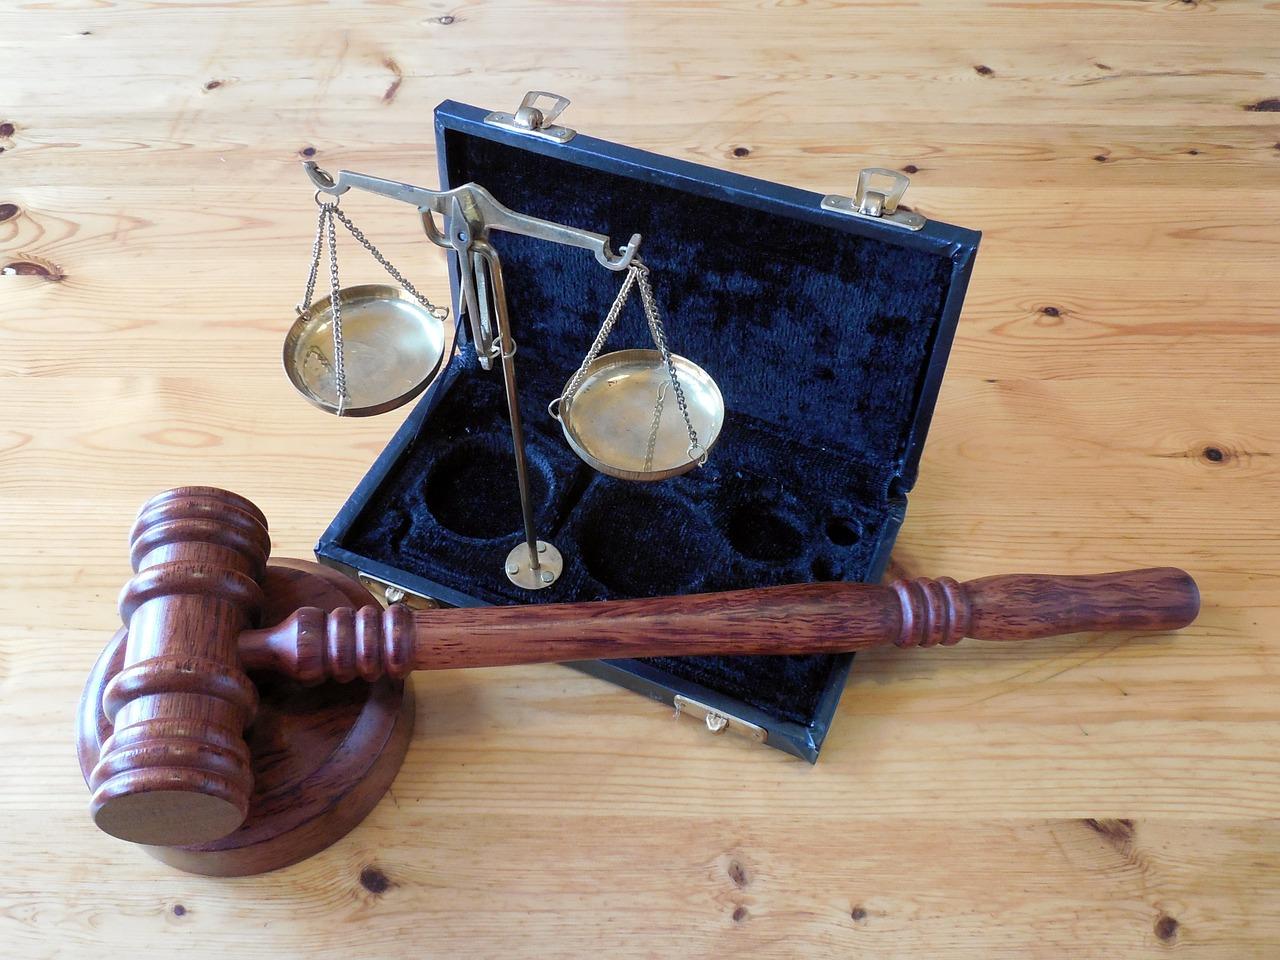 Mietvertragsgebühr Abgeschafft Regelung Mietvertragsgebühr österreich